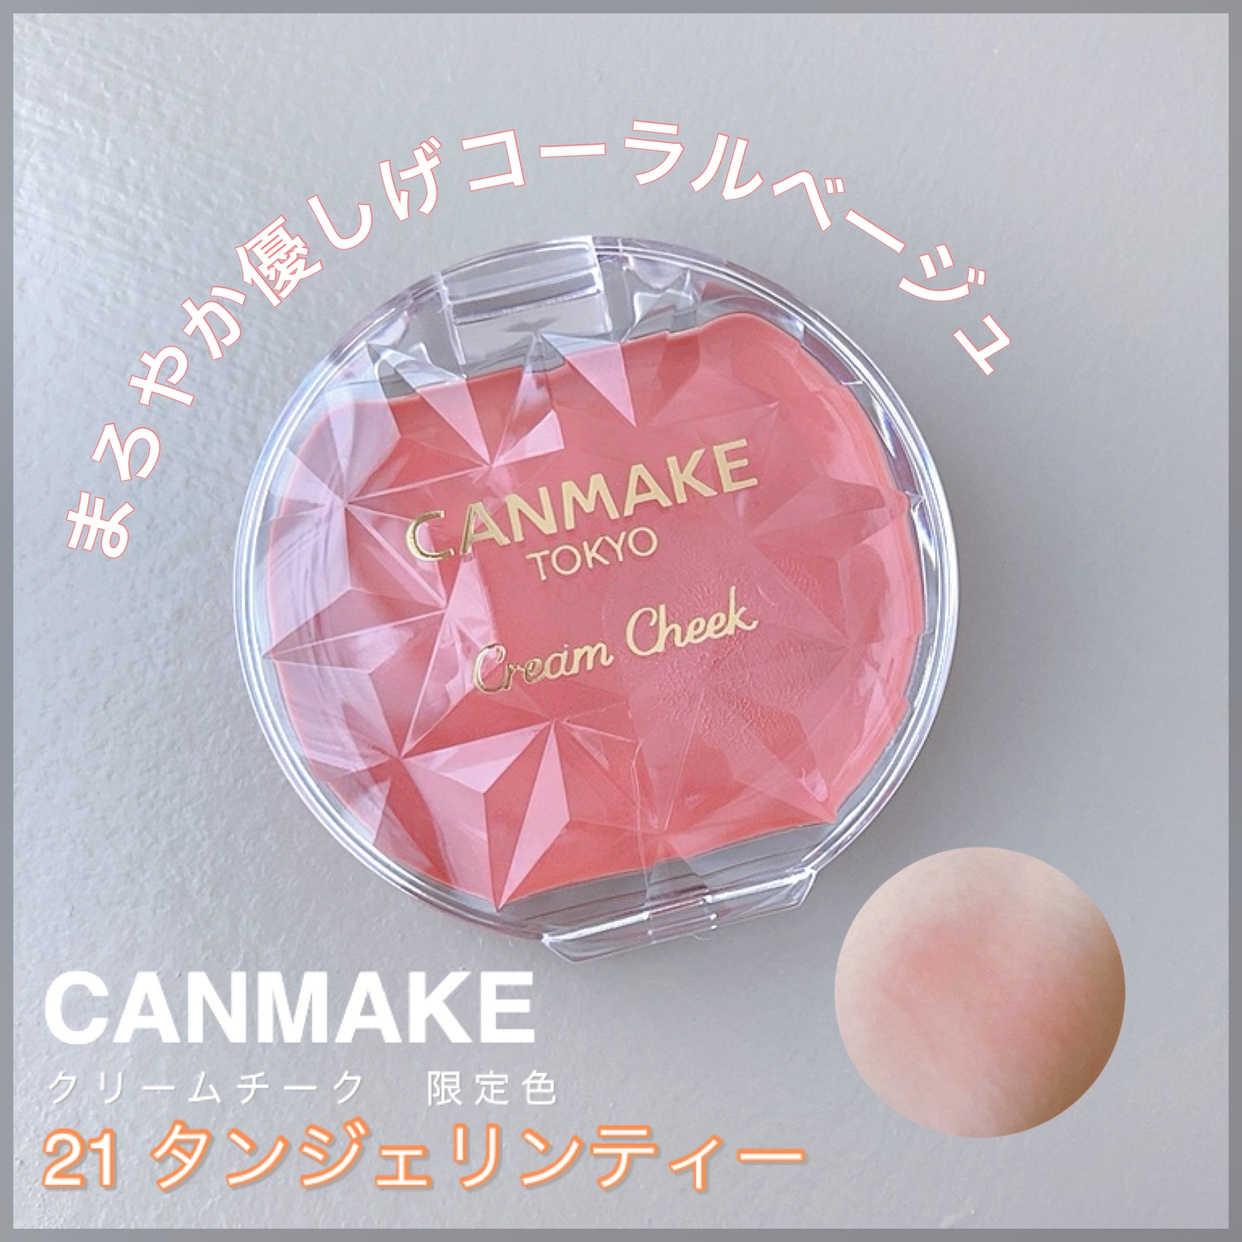 CANMAKE(キャンメイク) クリームチークを使ったrinqさんのクチコミ画像1